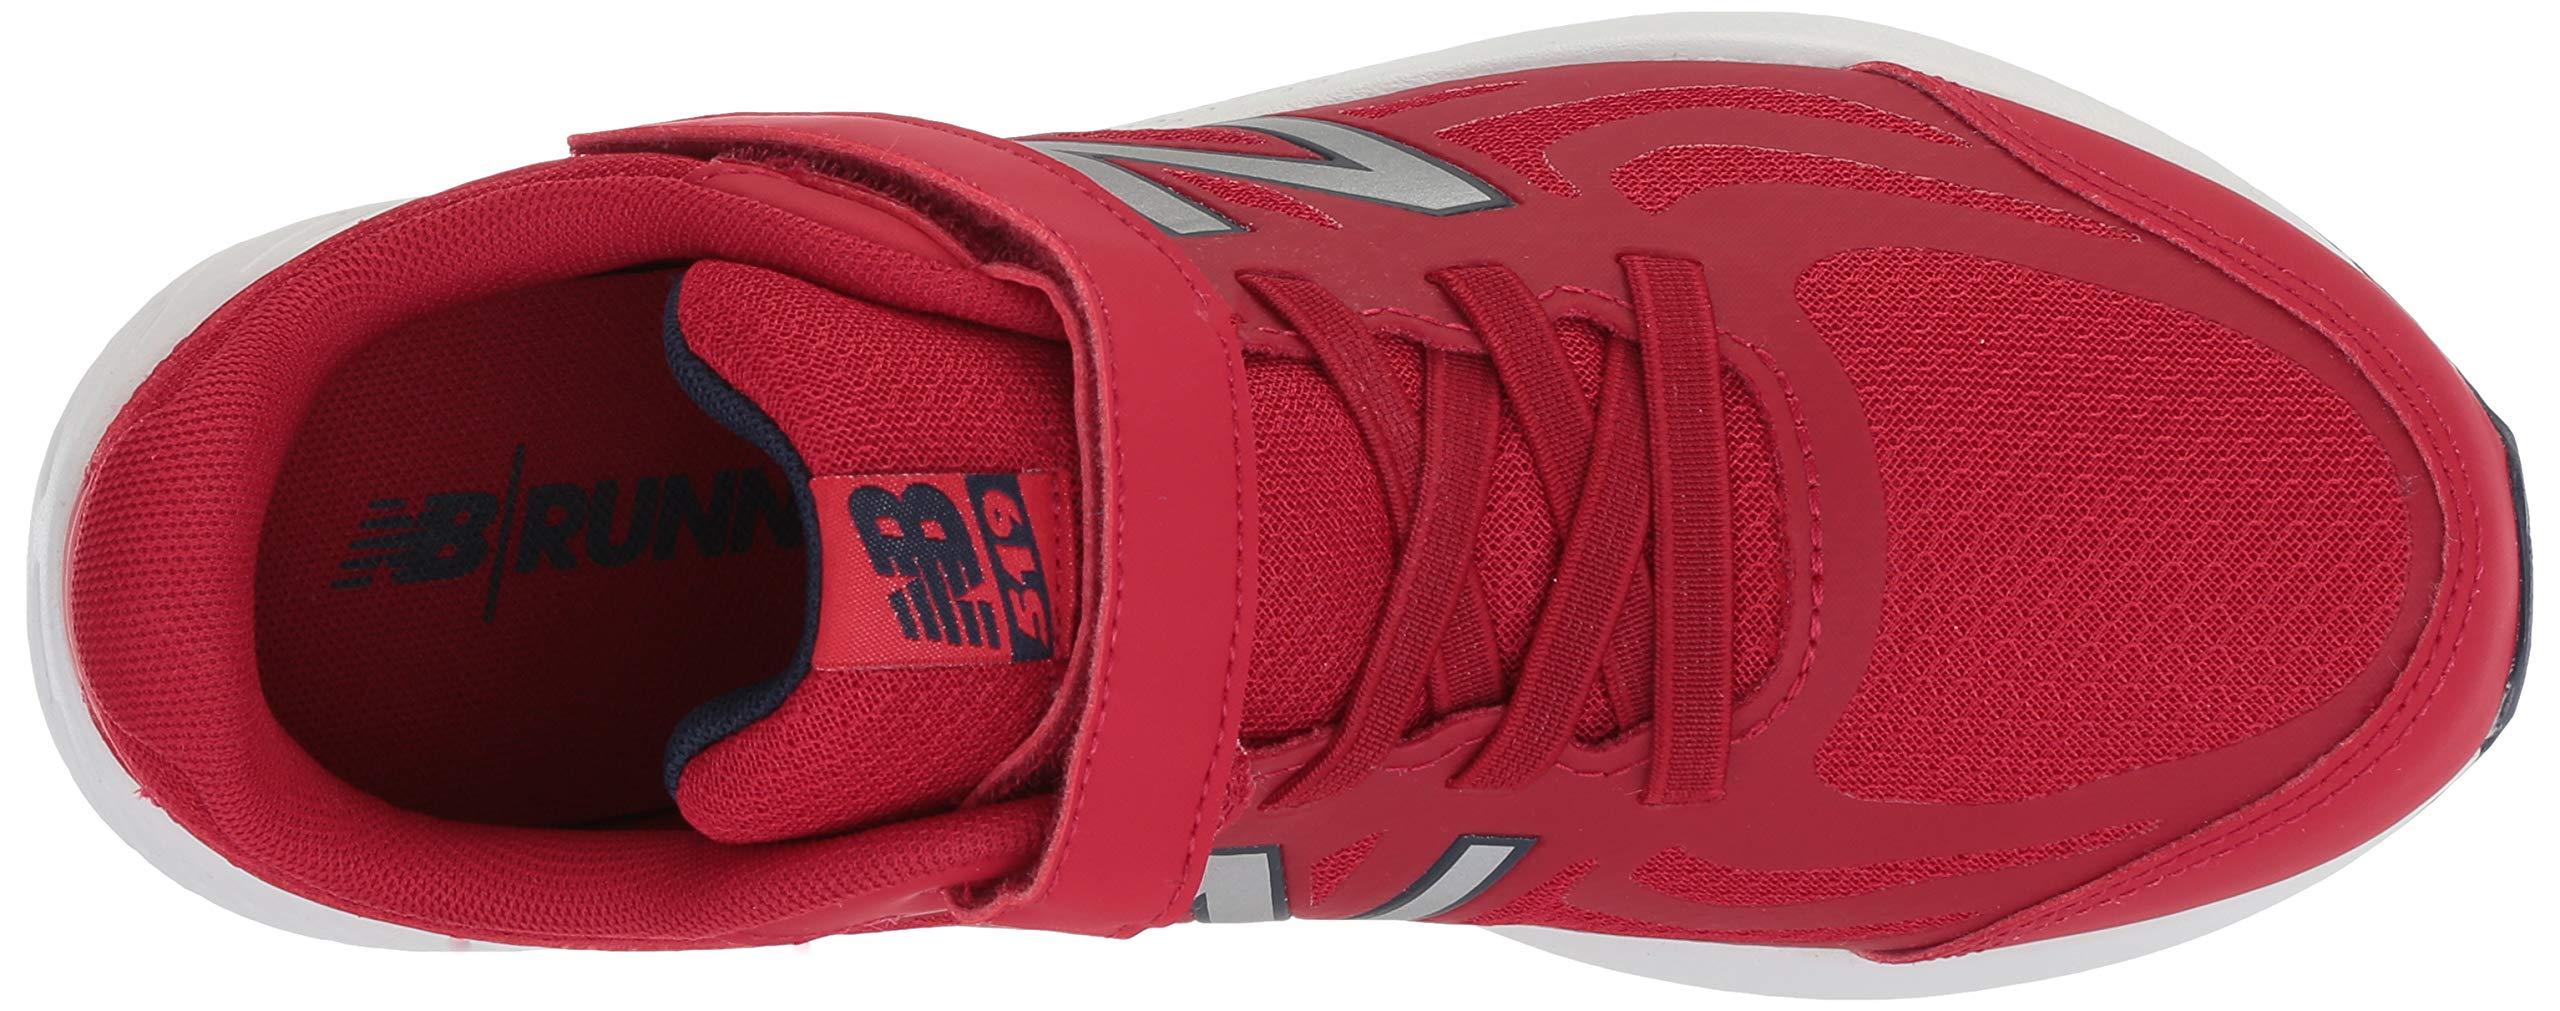 New Balance Boys' 519v1 Hook and Loop Running Shoe, Chili Pepper/Nubuck Scarlet, 2 M US Infant by New Balance (Image #8)